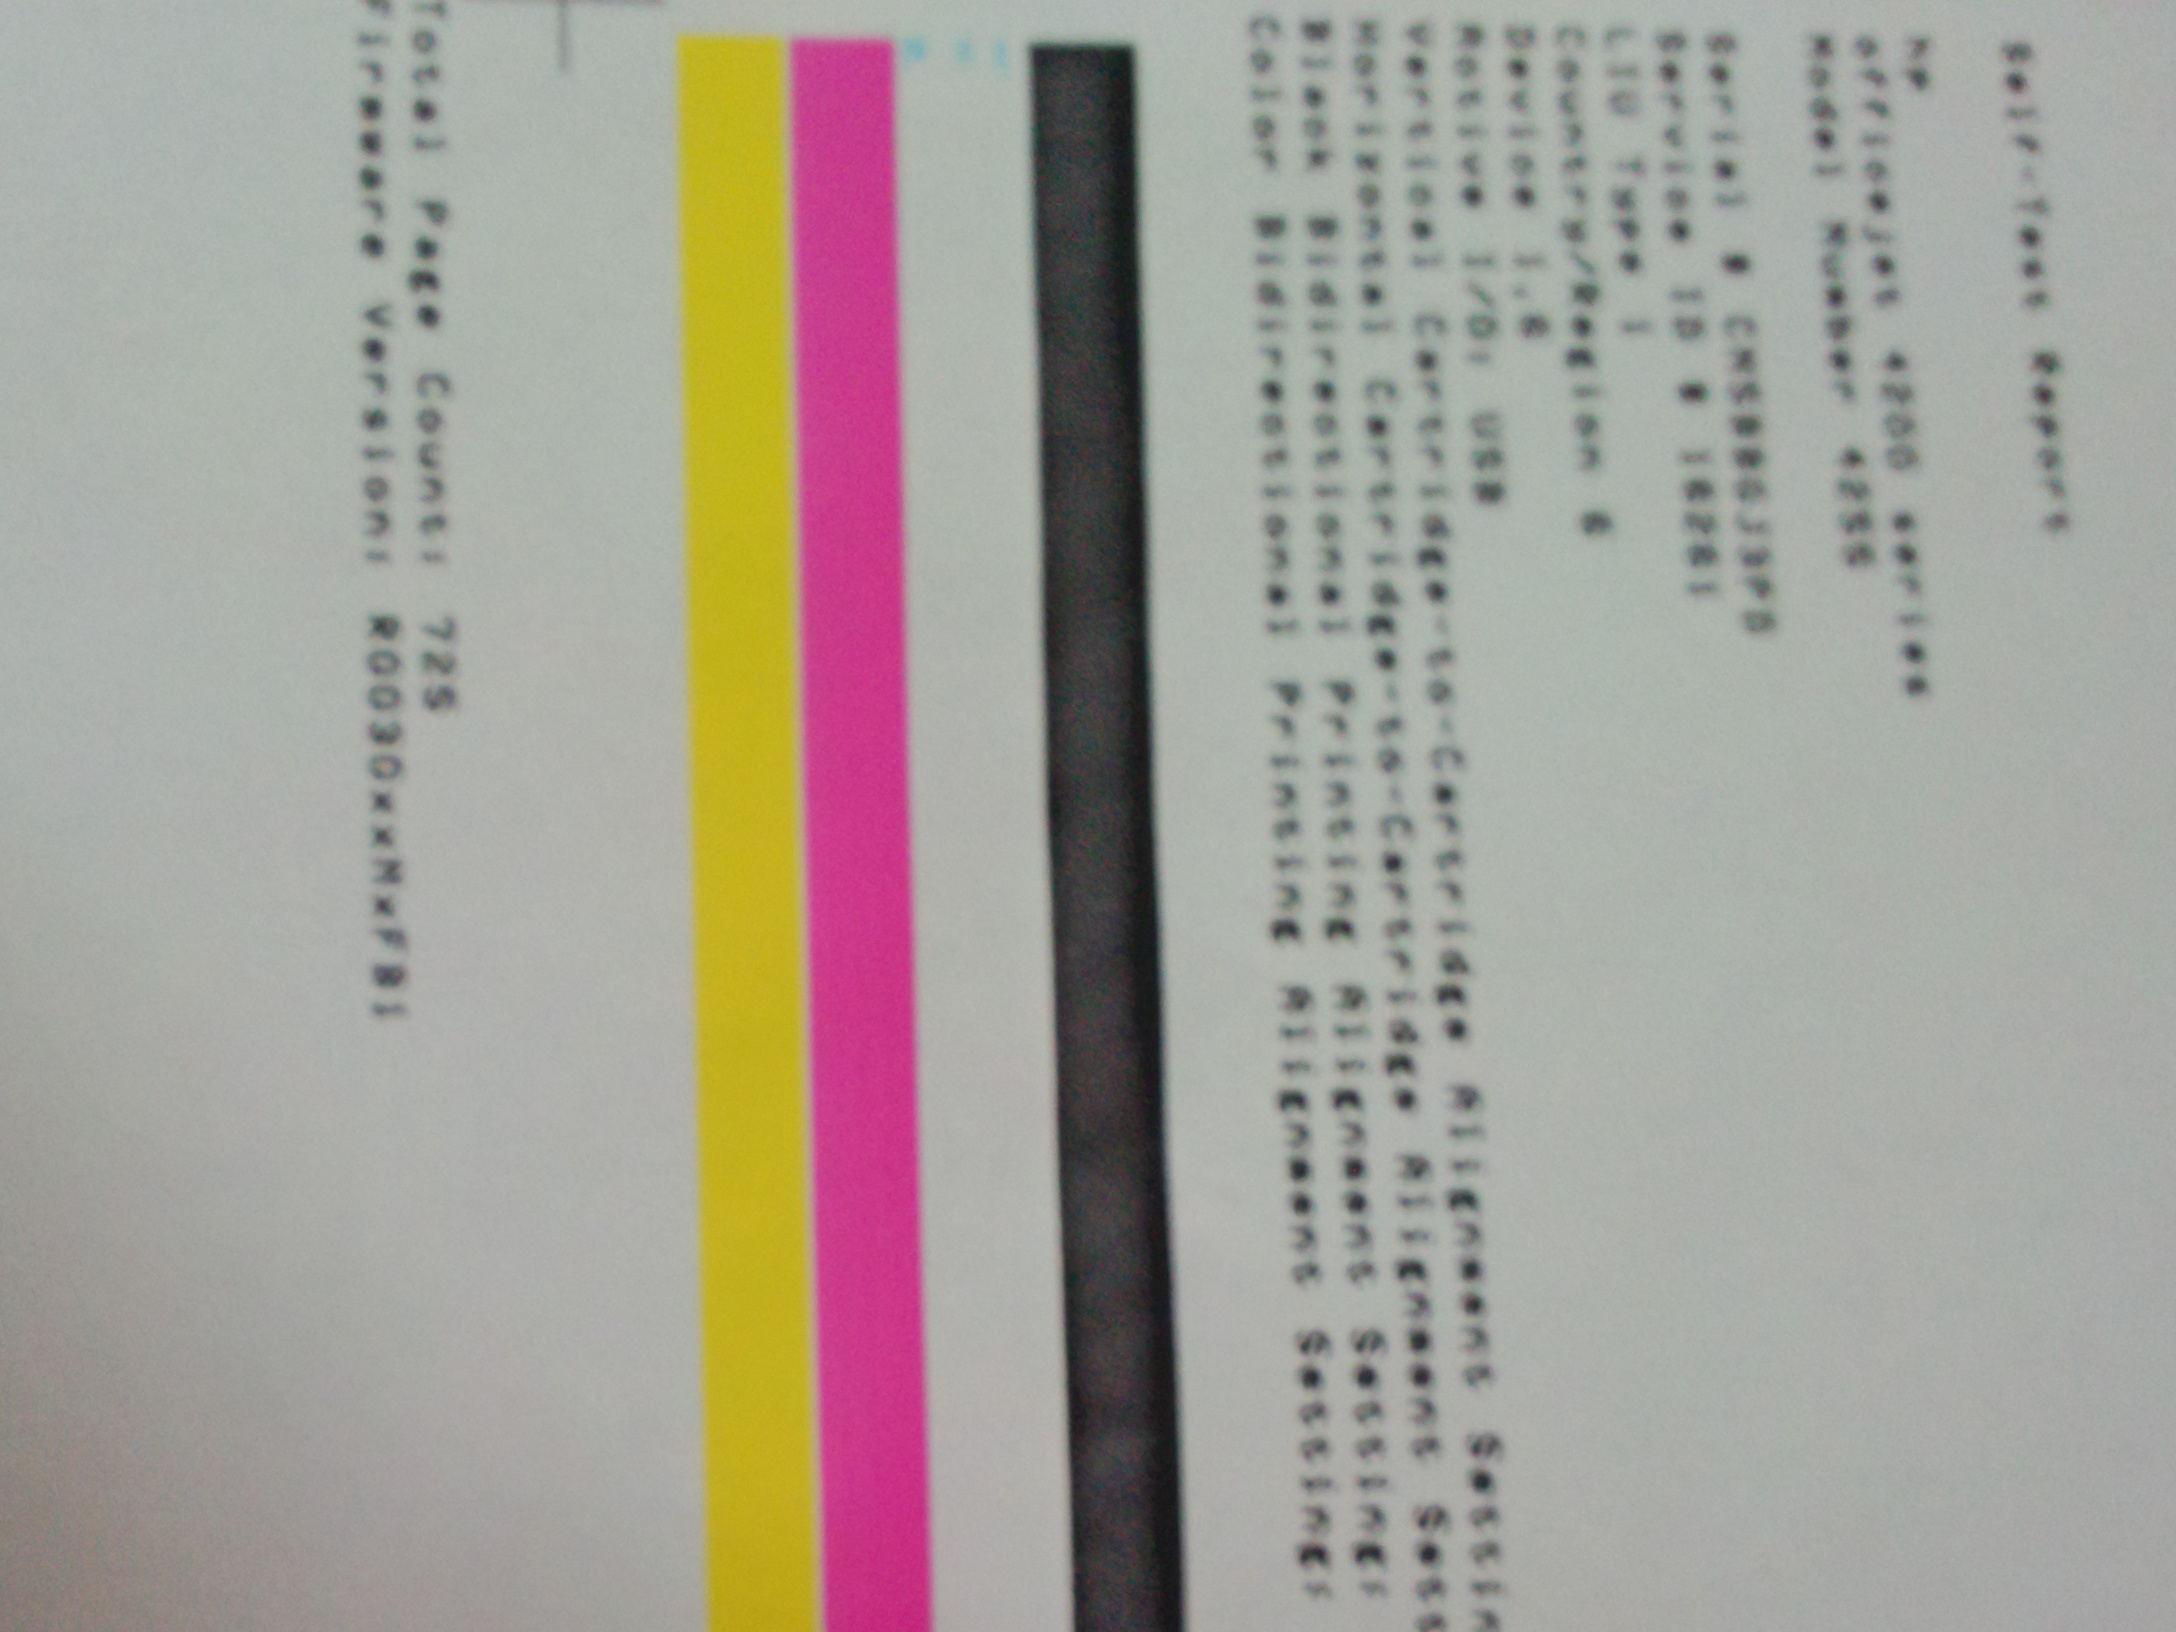 P50103-174040_2345看图王_看图王.jpg